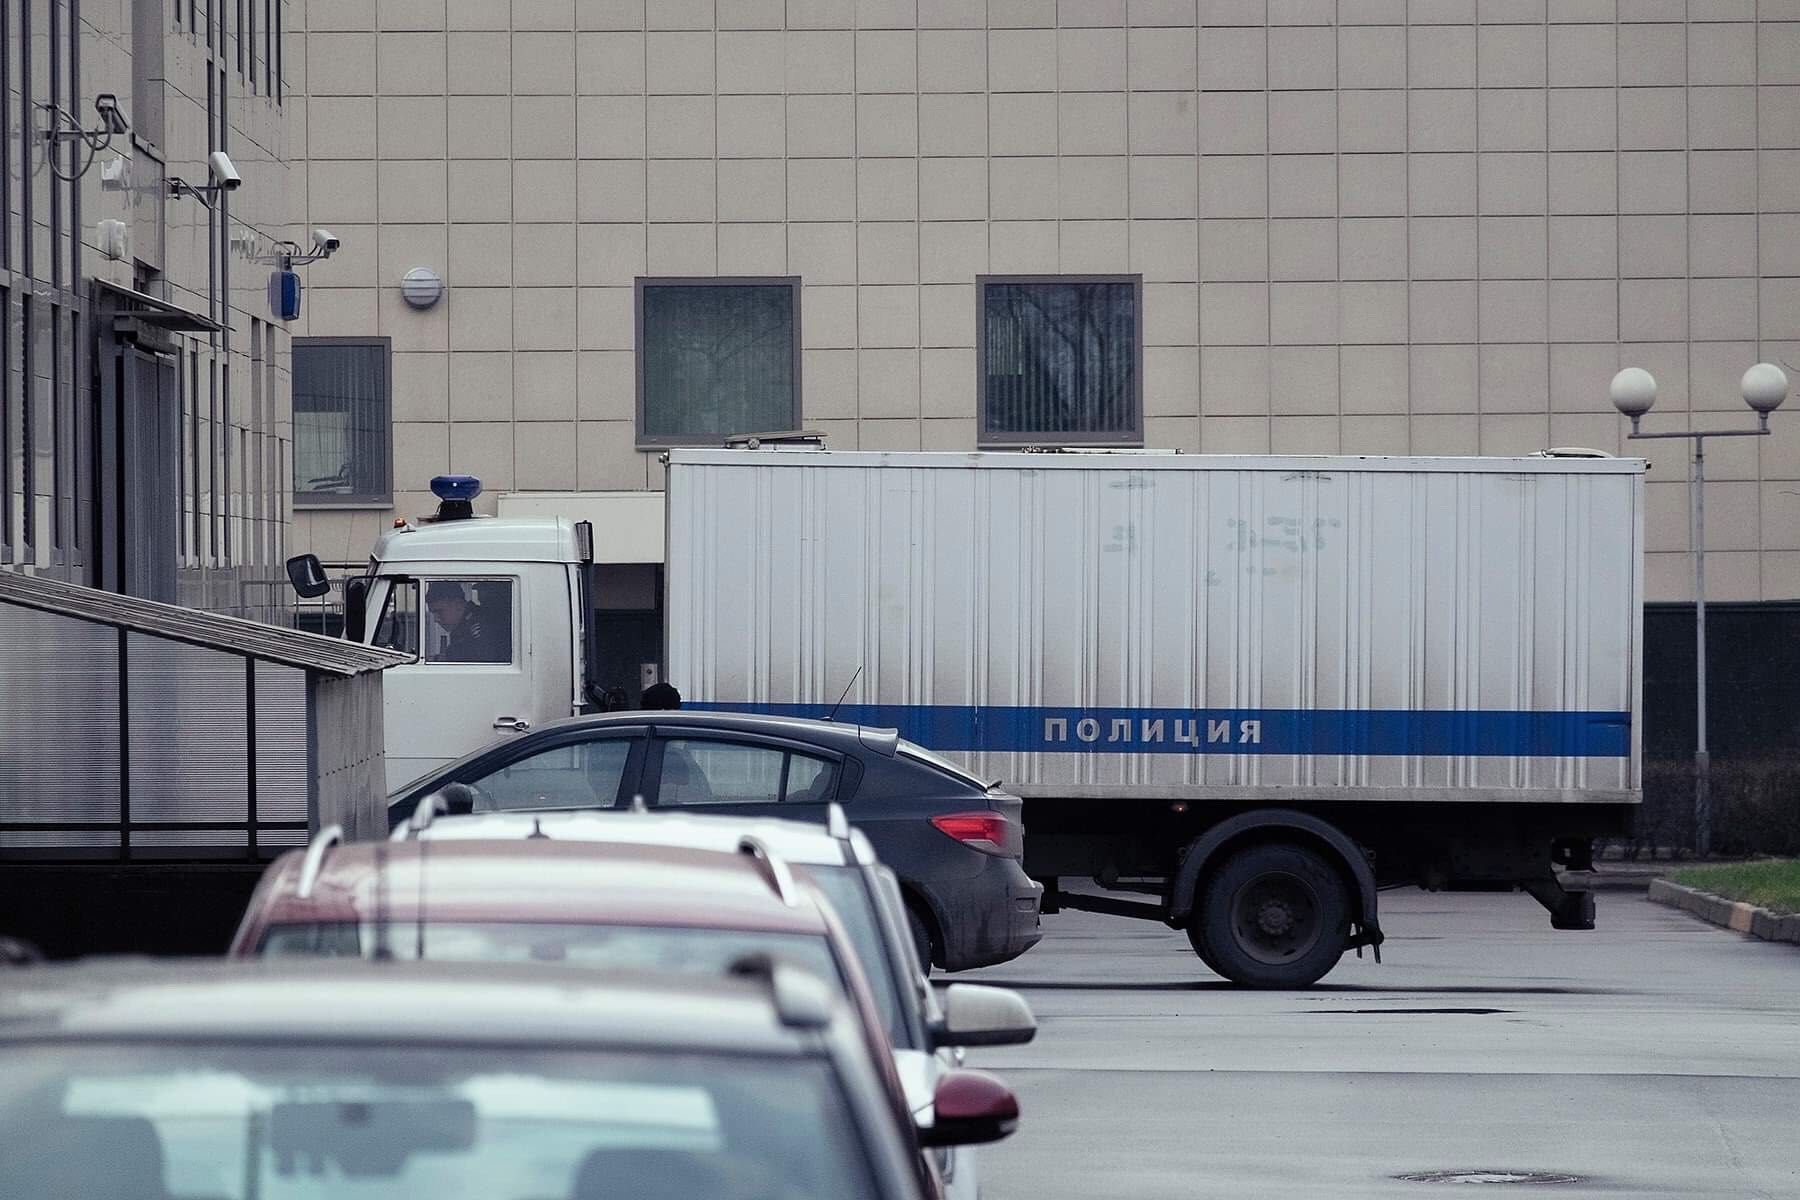 En fangetransportbil på vei til retten i Moskva.